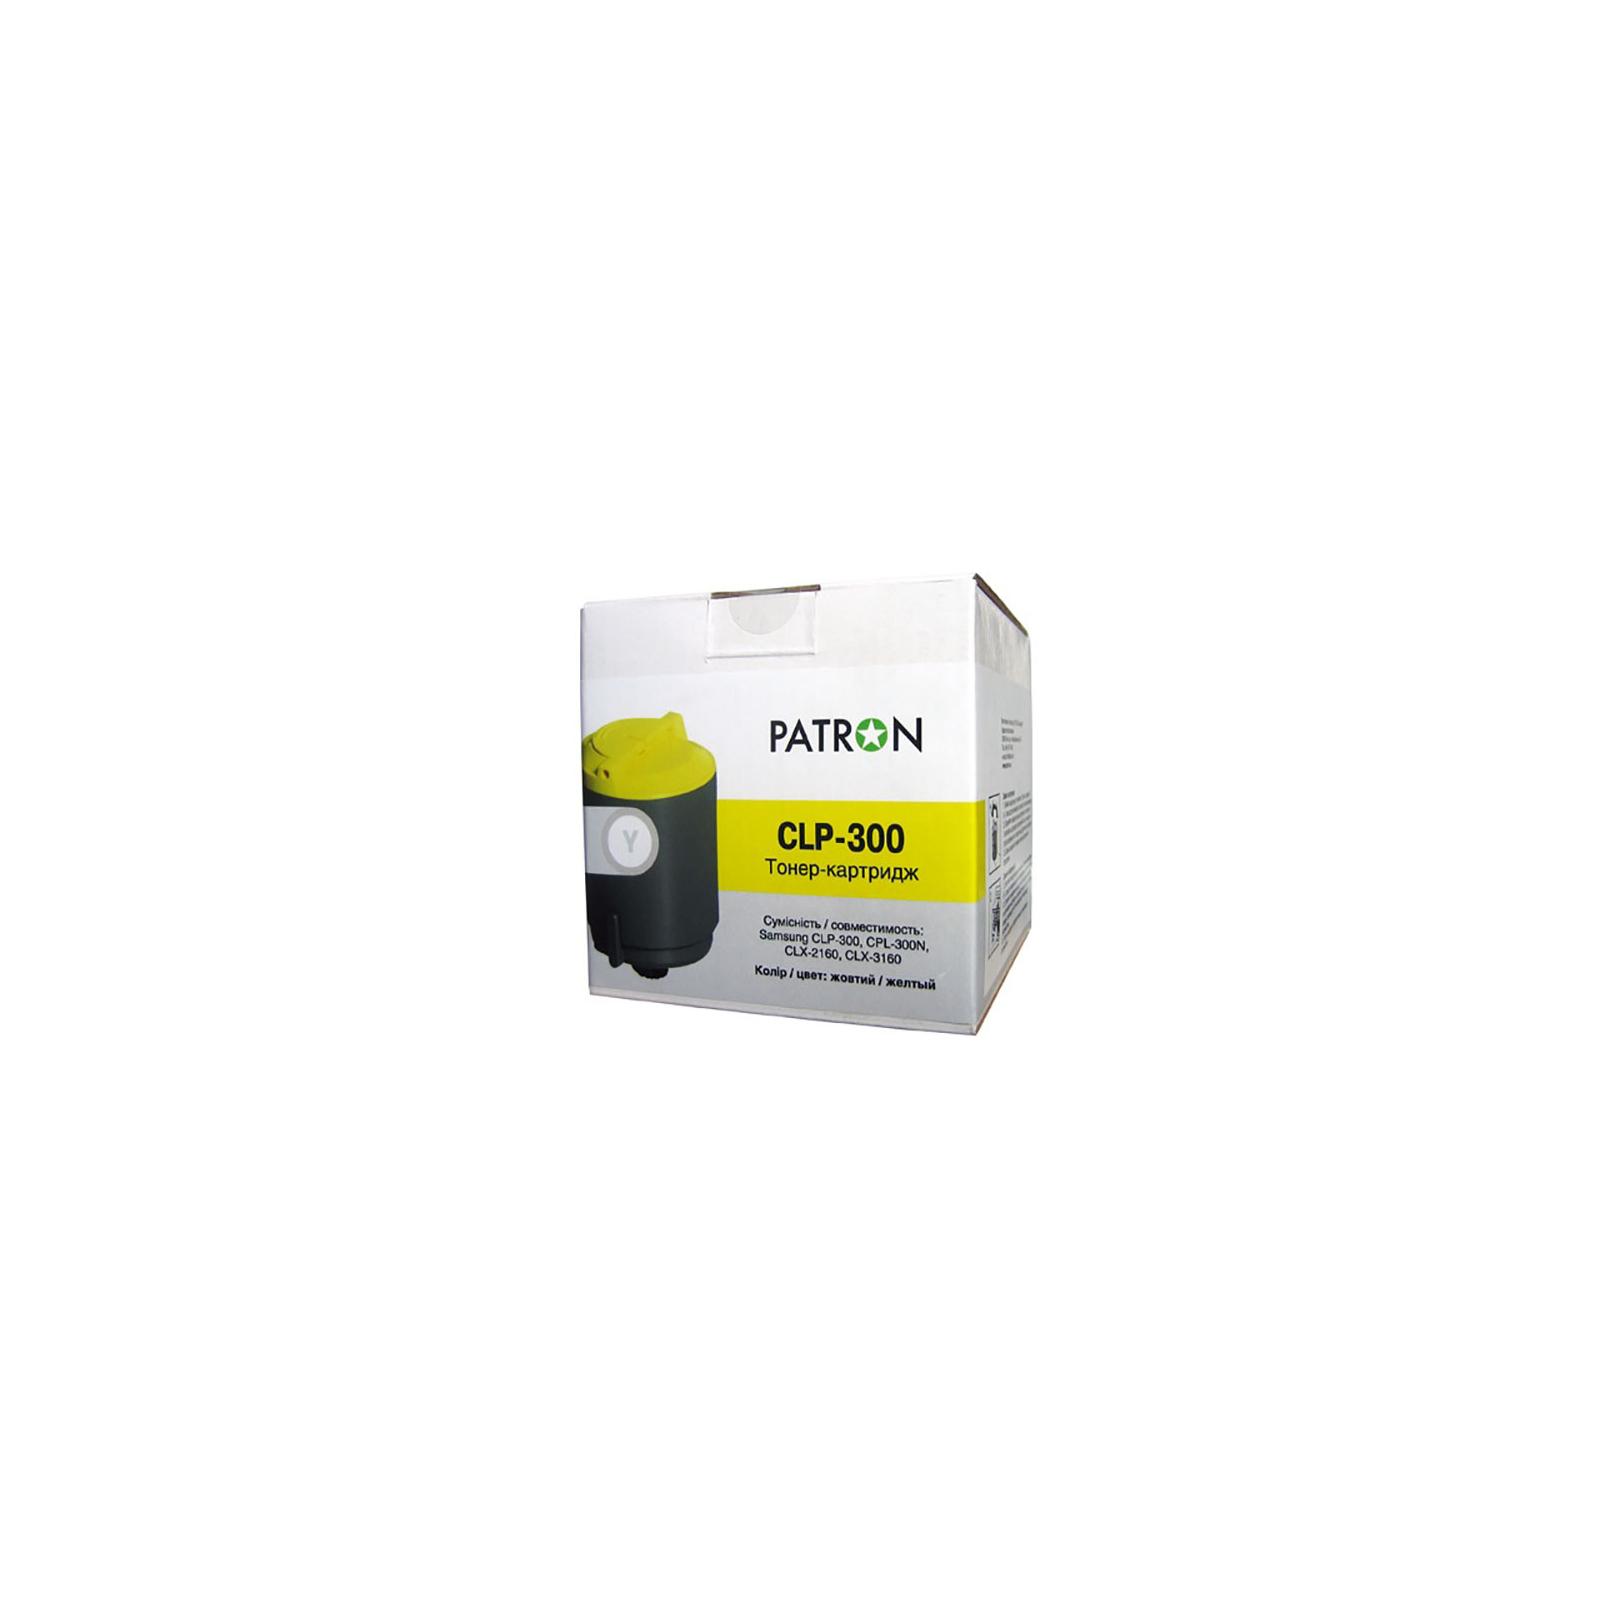 Картридж PATRON SAMSUNG CLP-300 (PN-CLPY300) YELLOW (CT-SAM-CLP-300-Y-PN)